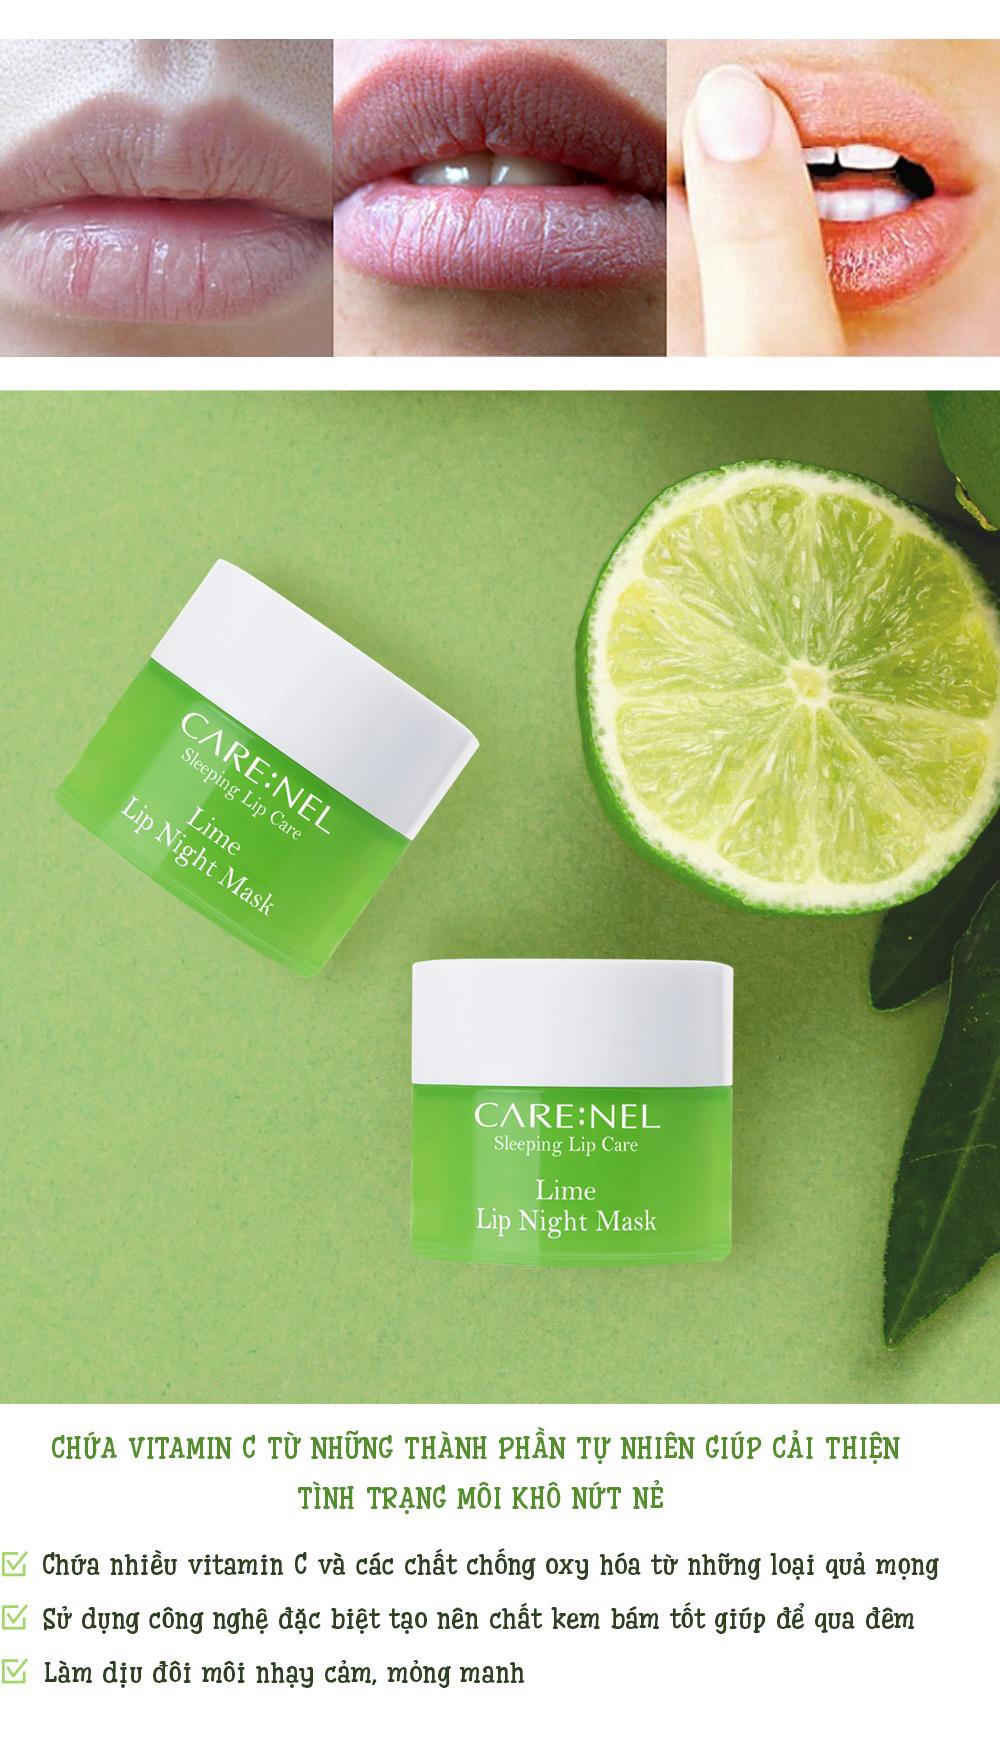 Mat Na Ngu Carenel Lime Lip Night Mask (11)